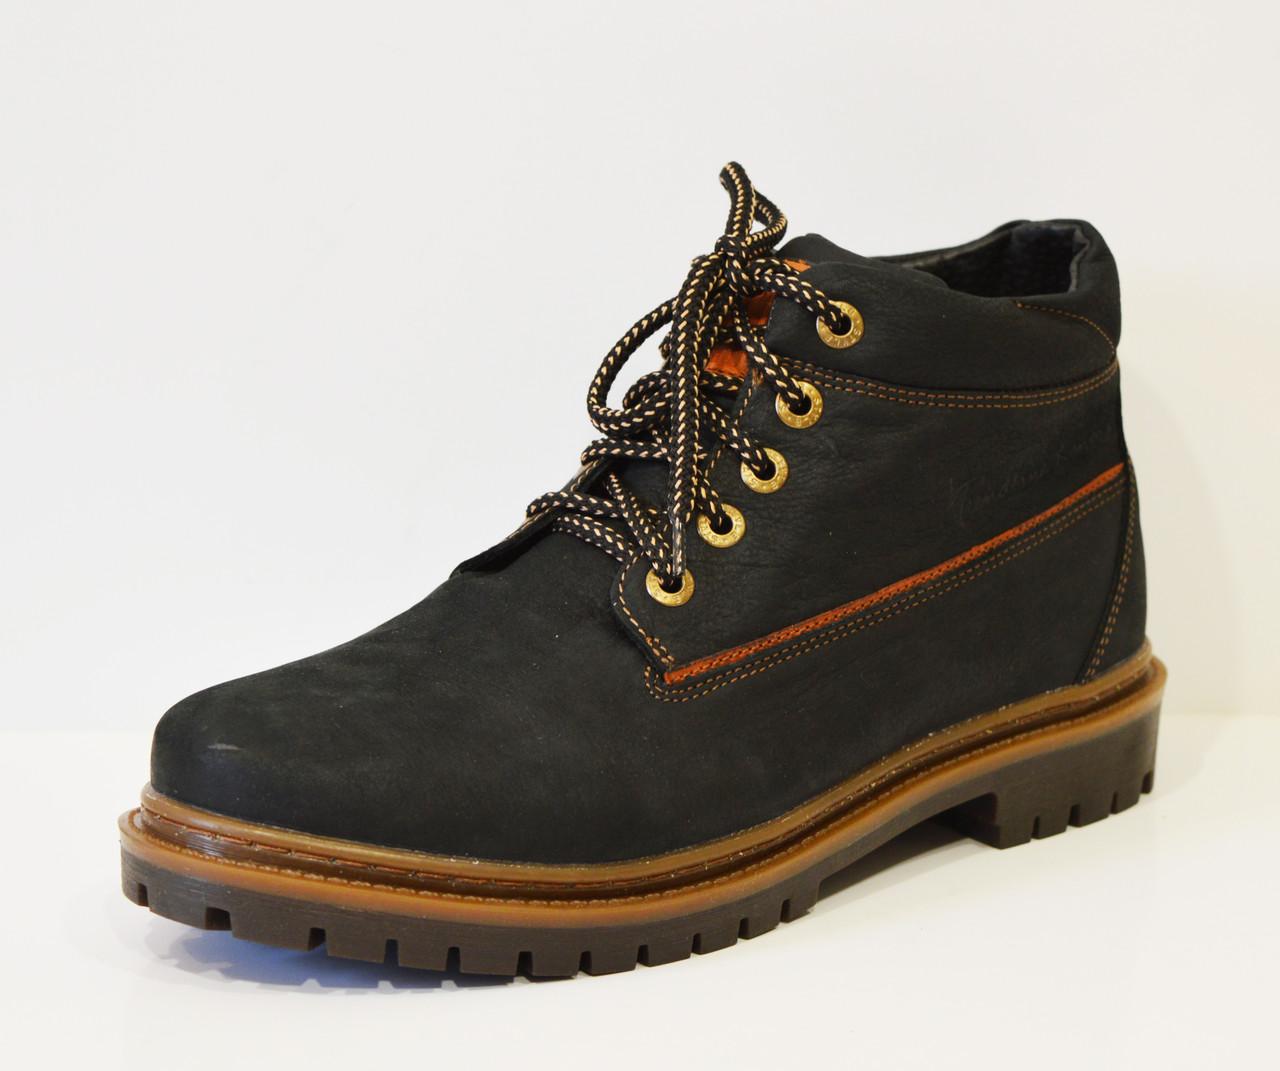 1aa2a7a81 Зимние мужские ботинки Konors 368 - КРЕЩАТИК - интернет магазин обуви в  Александрии